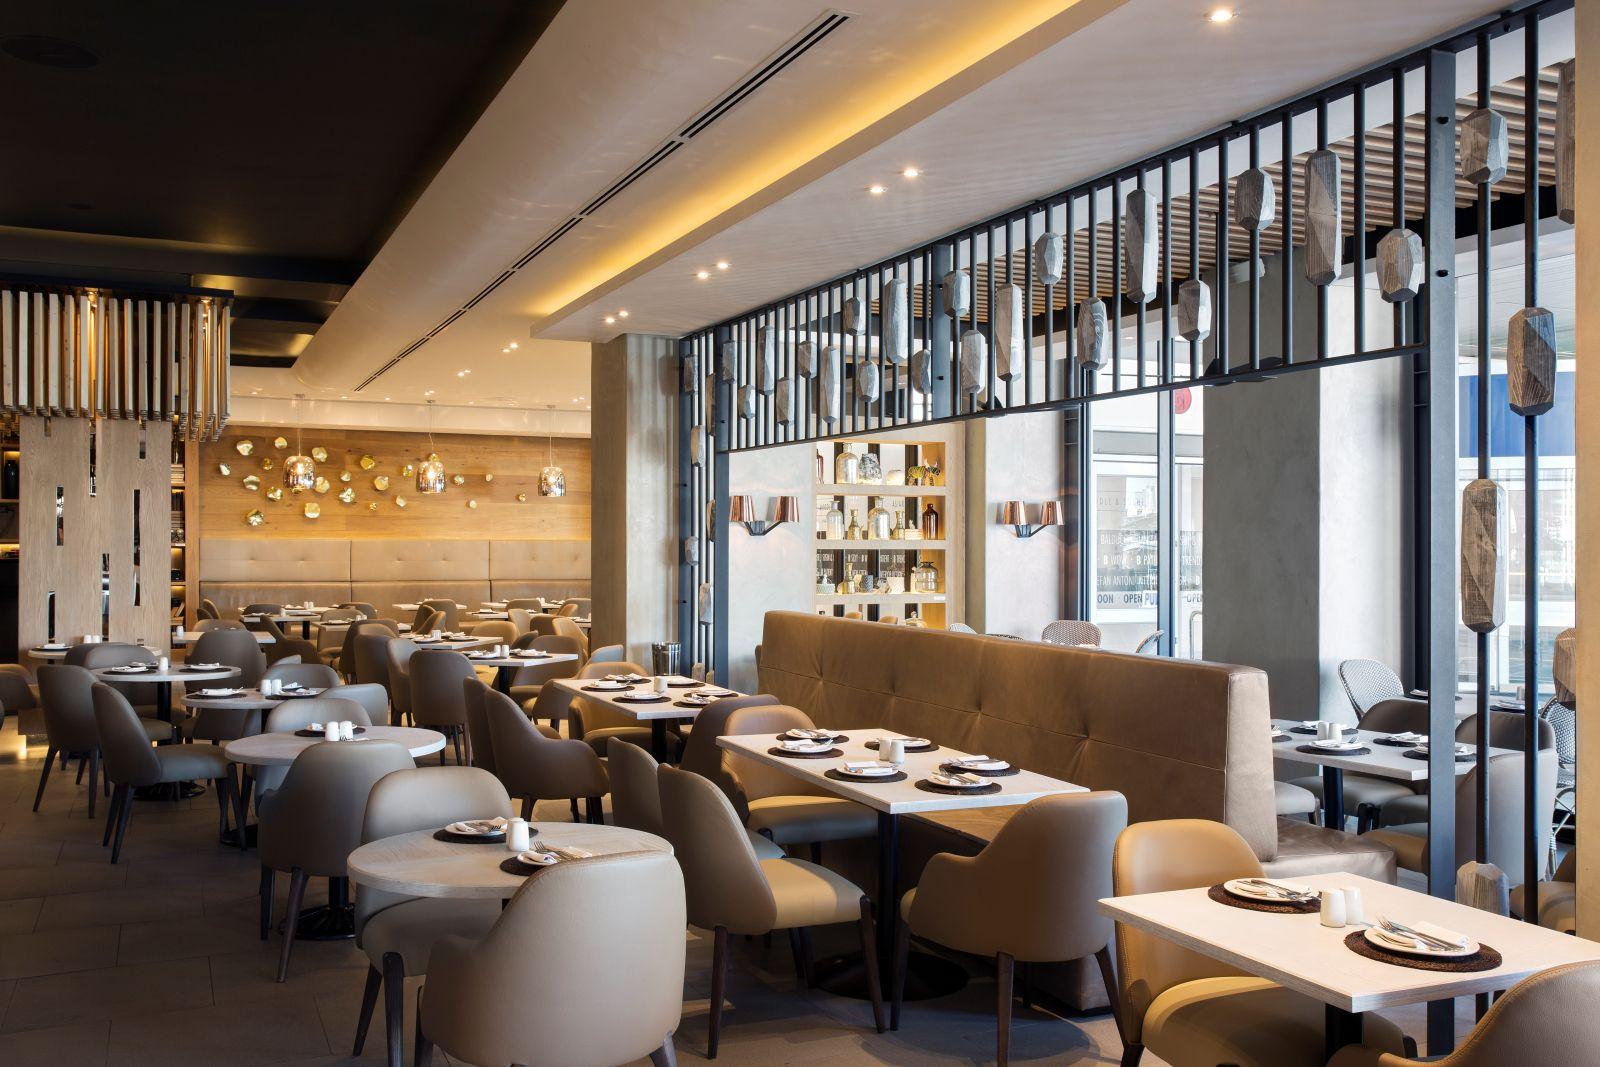 Balducci restaurant by arrcc